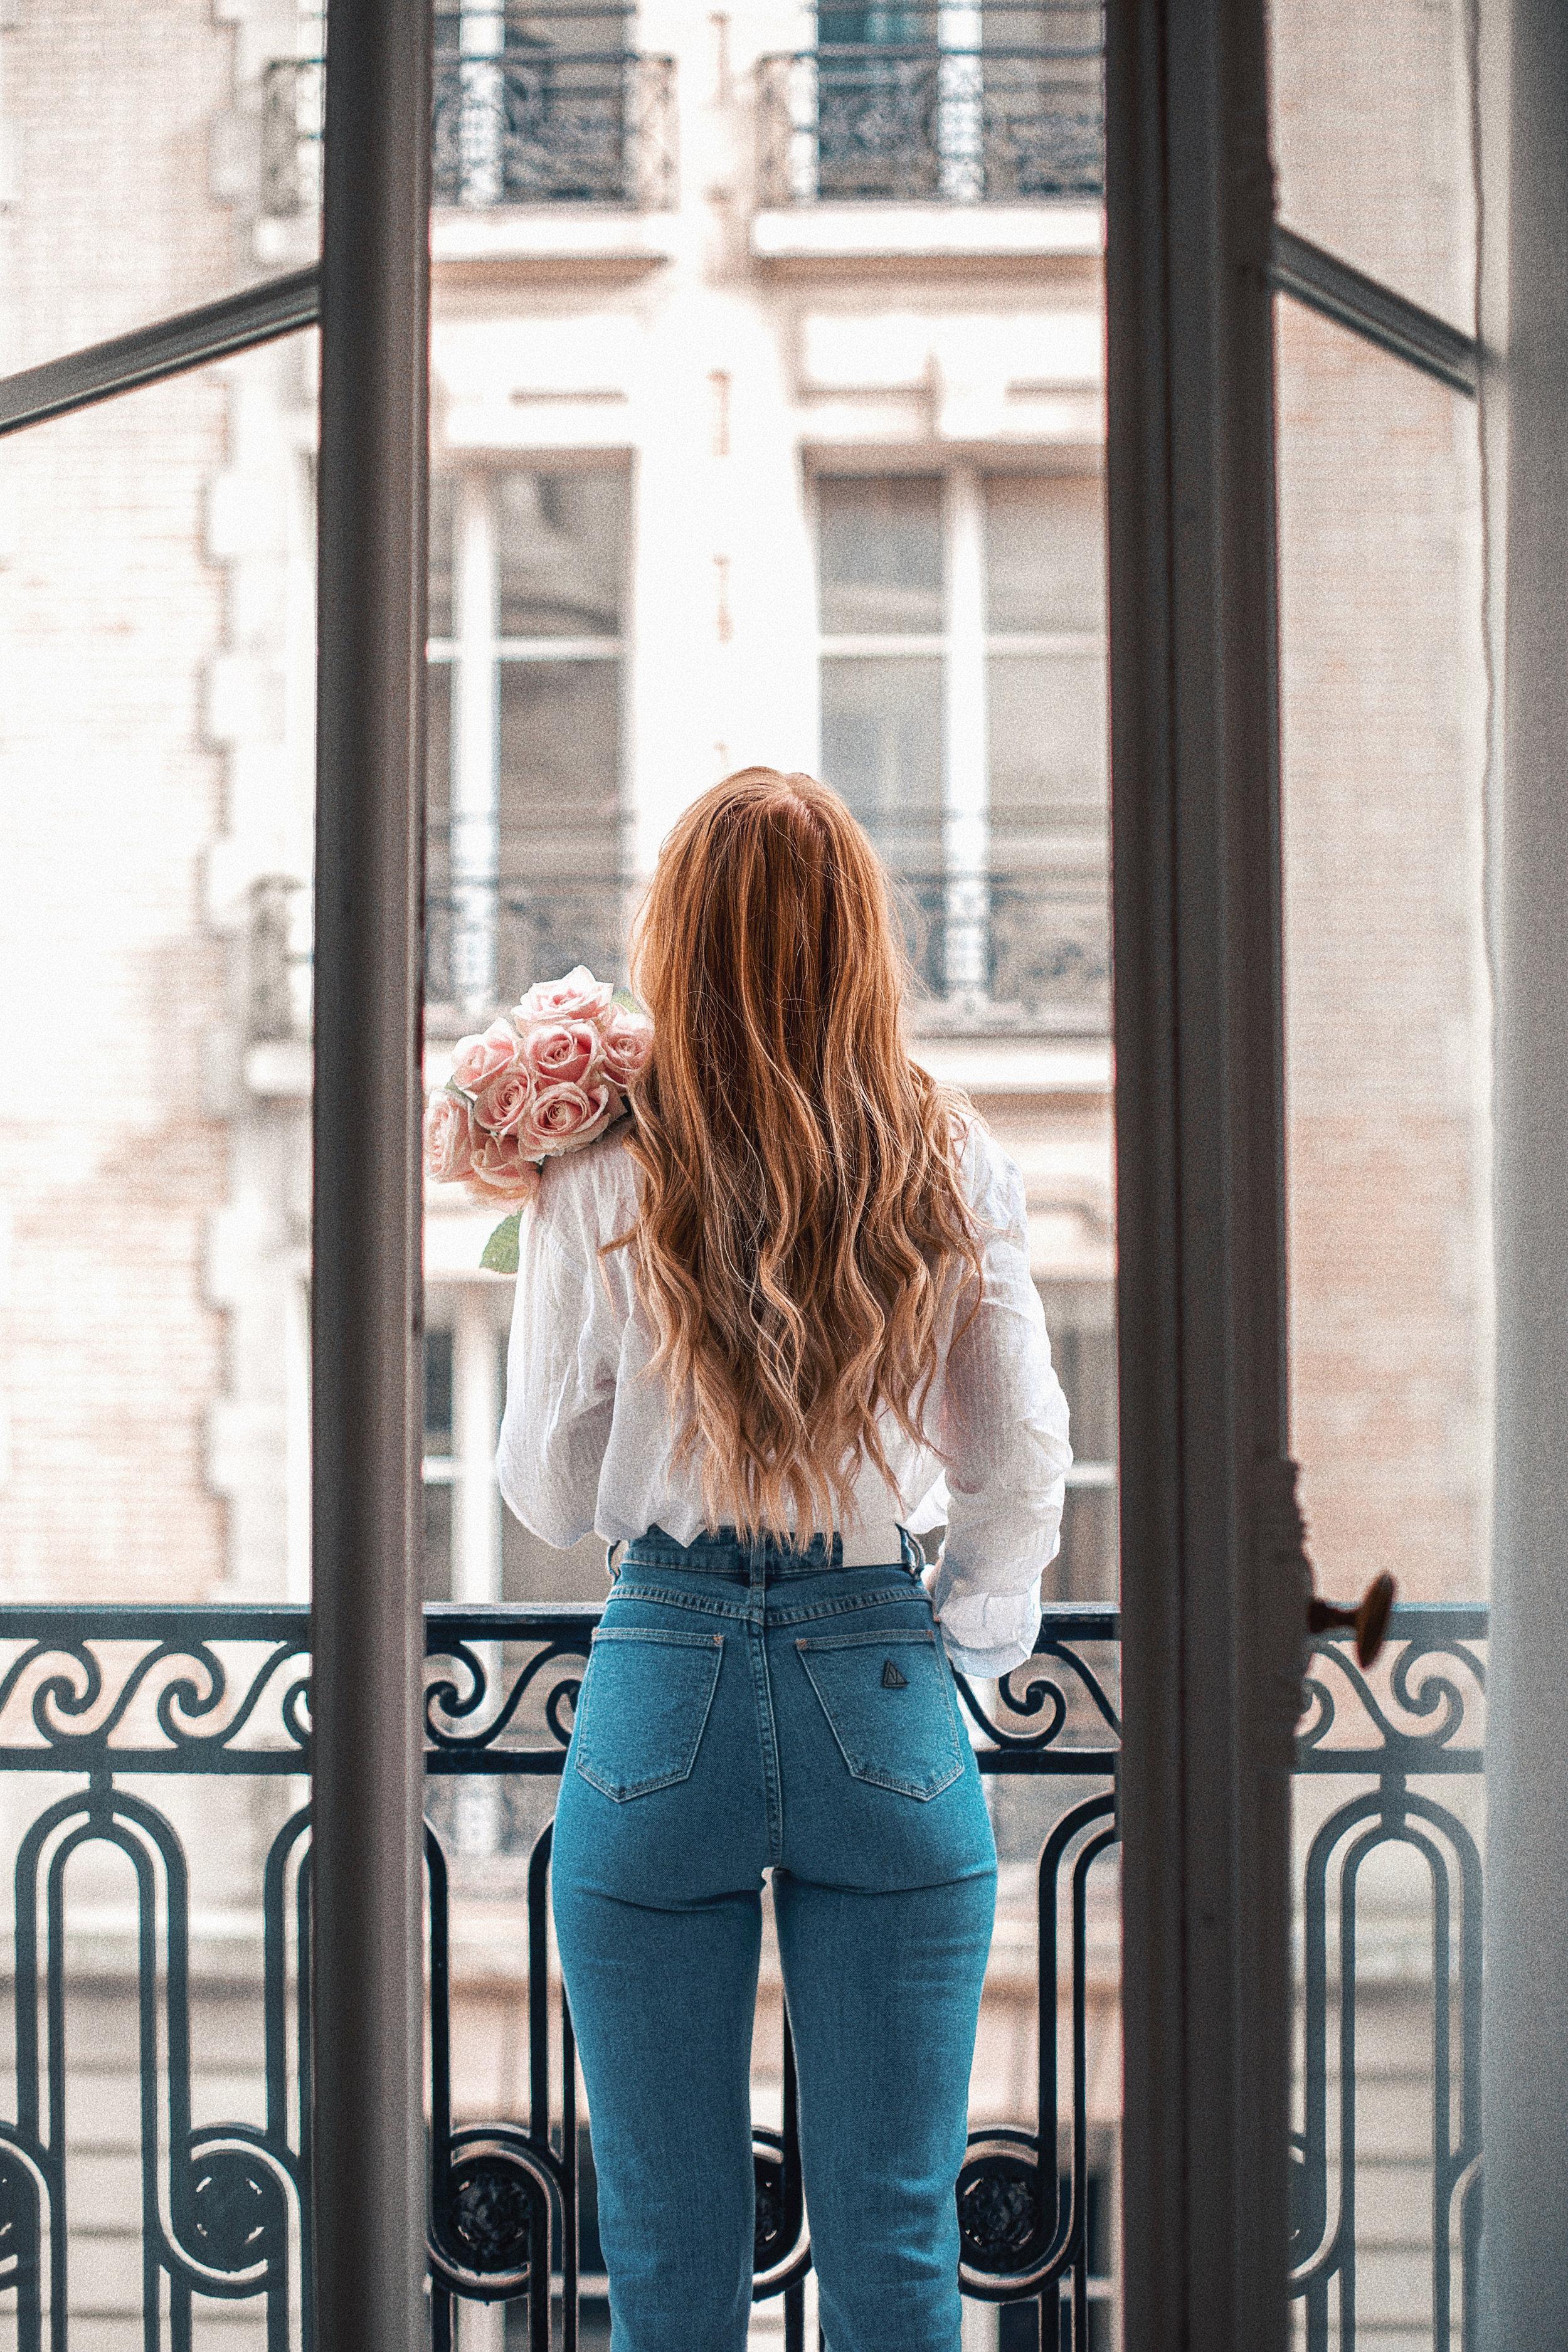 lion-in-the-wild_paris-hotel-balcony-romance-pink-roses_2.jpg